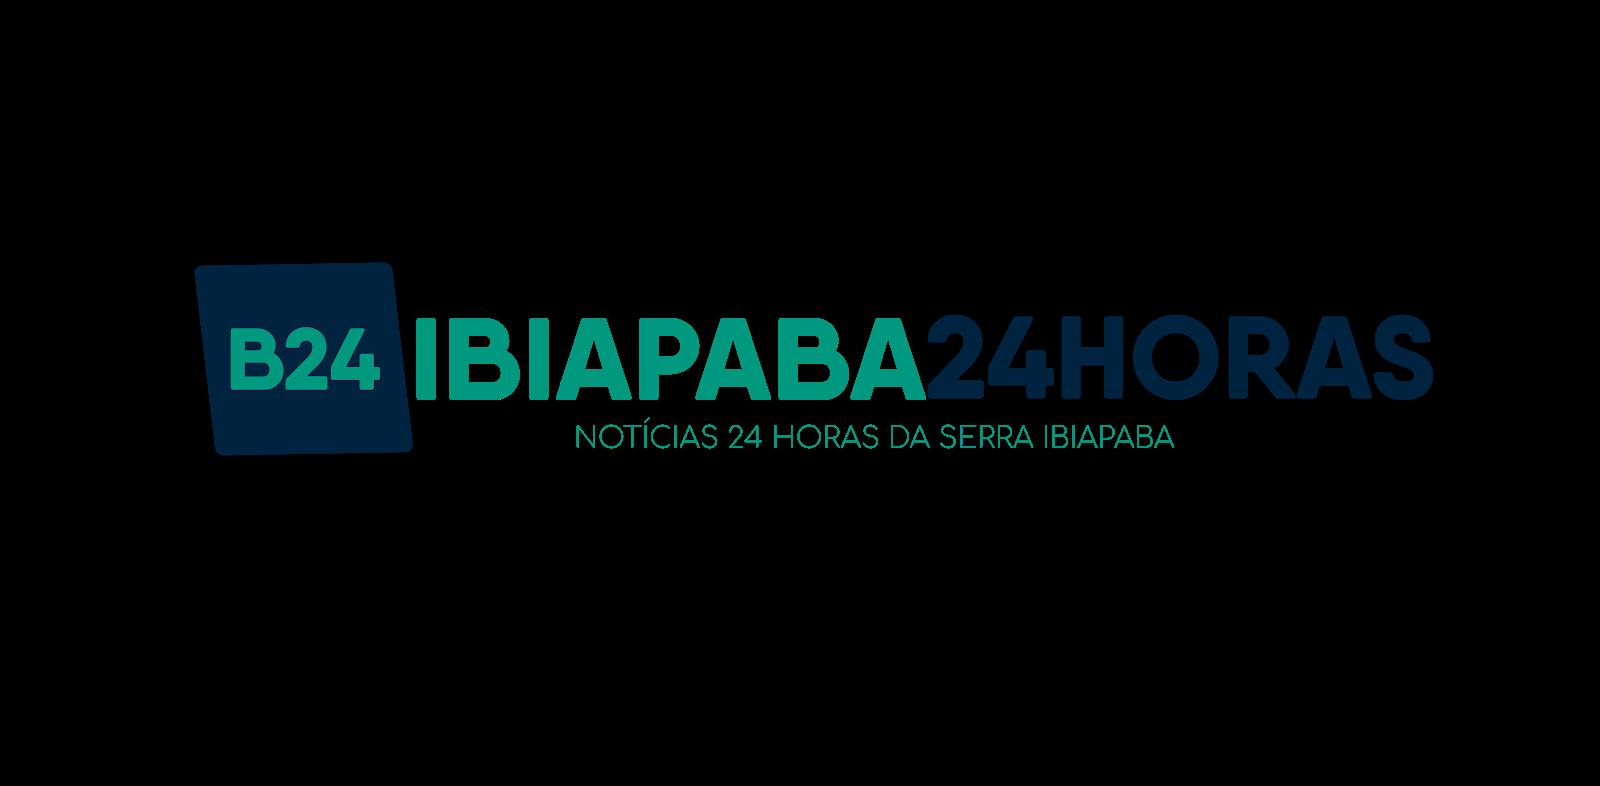 IBIAPABA 24 HORAS